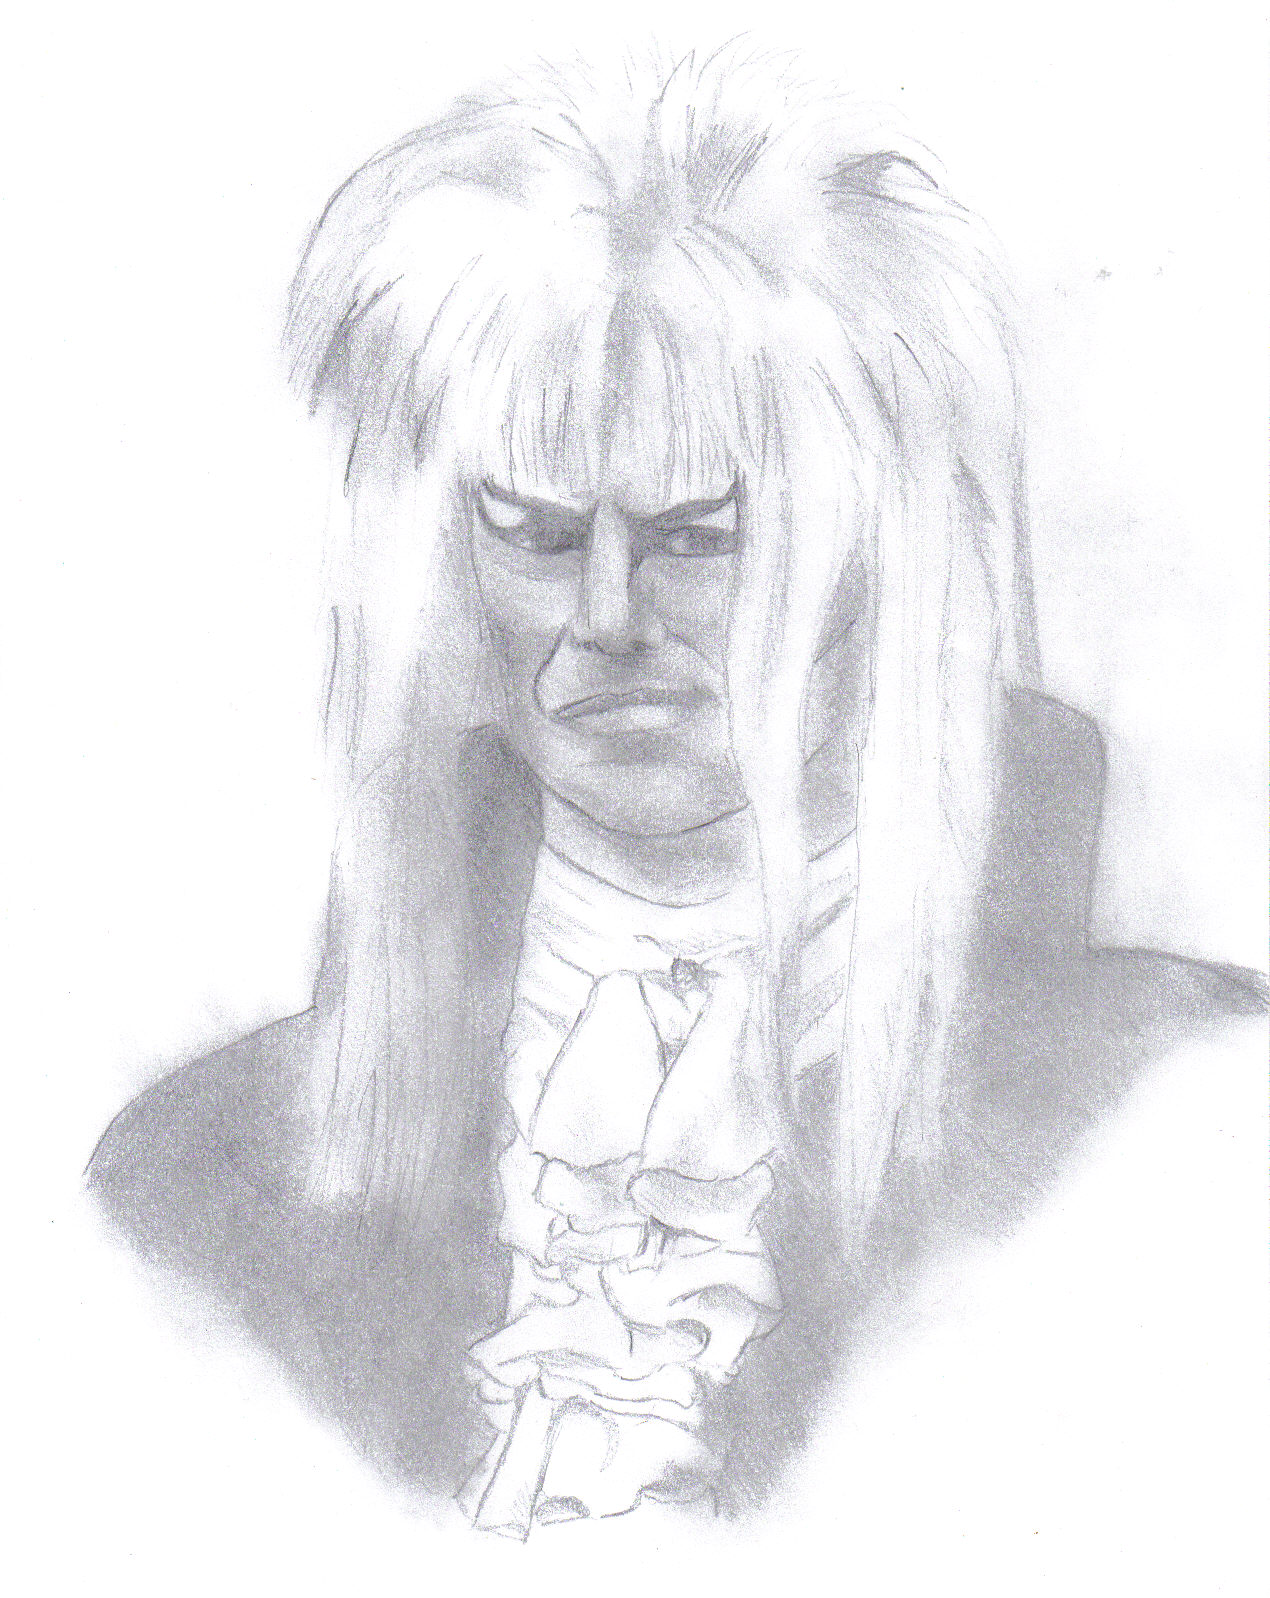 Jareth, King of the labyrinth by AylaWilson23